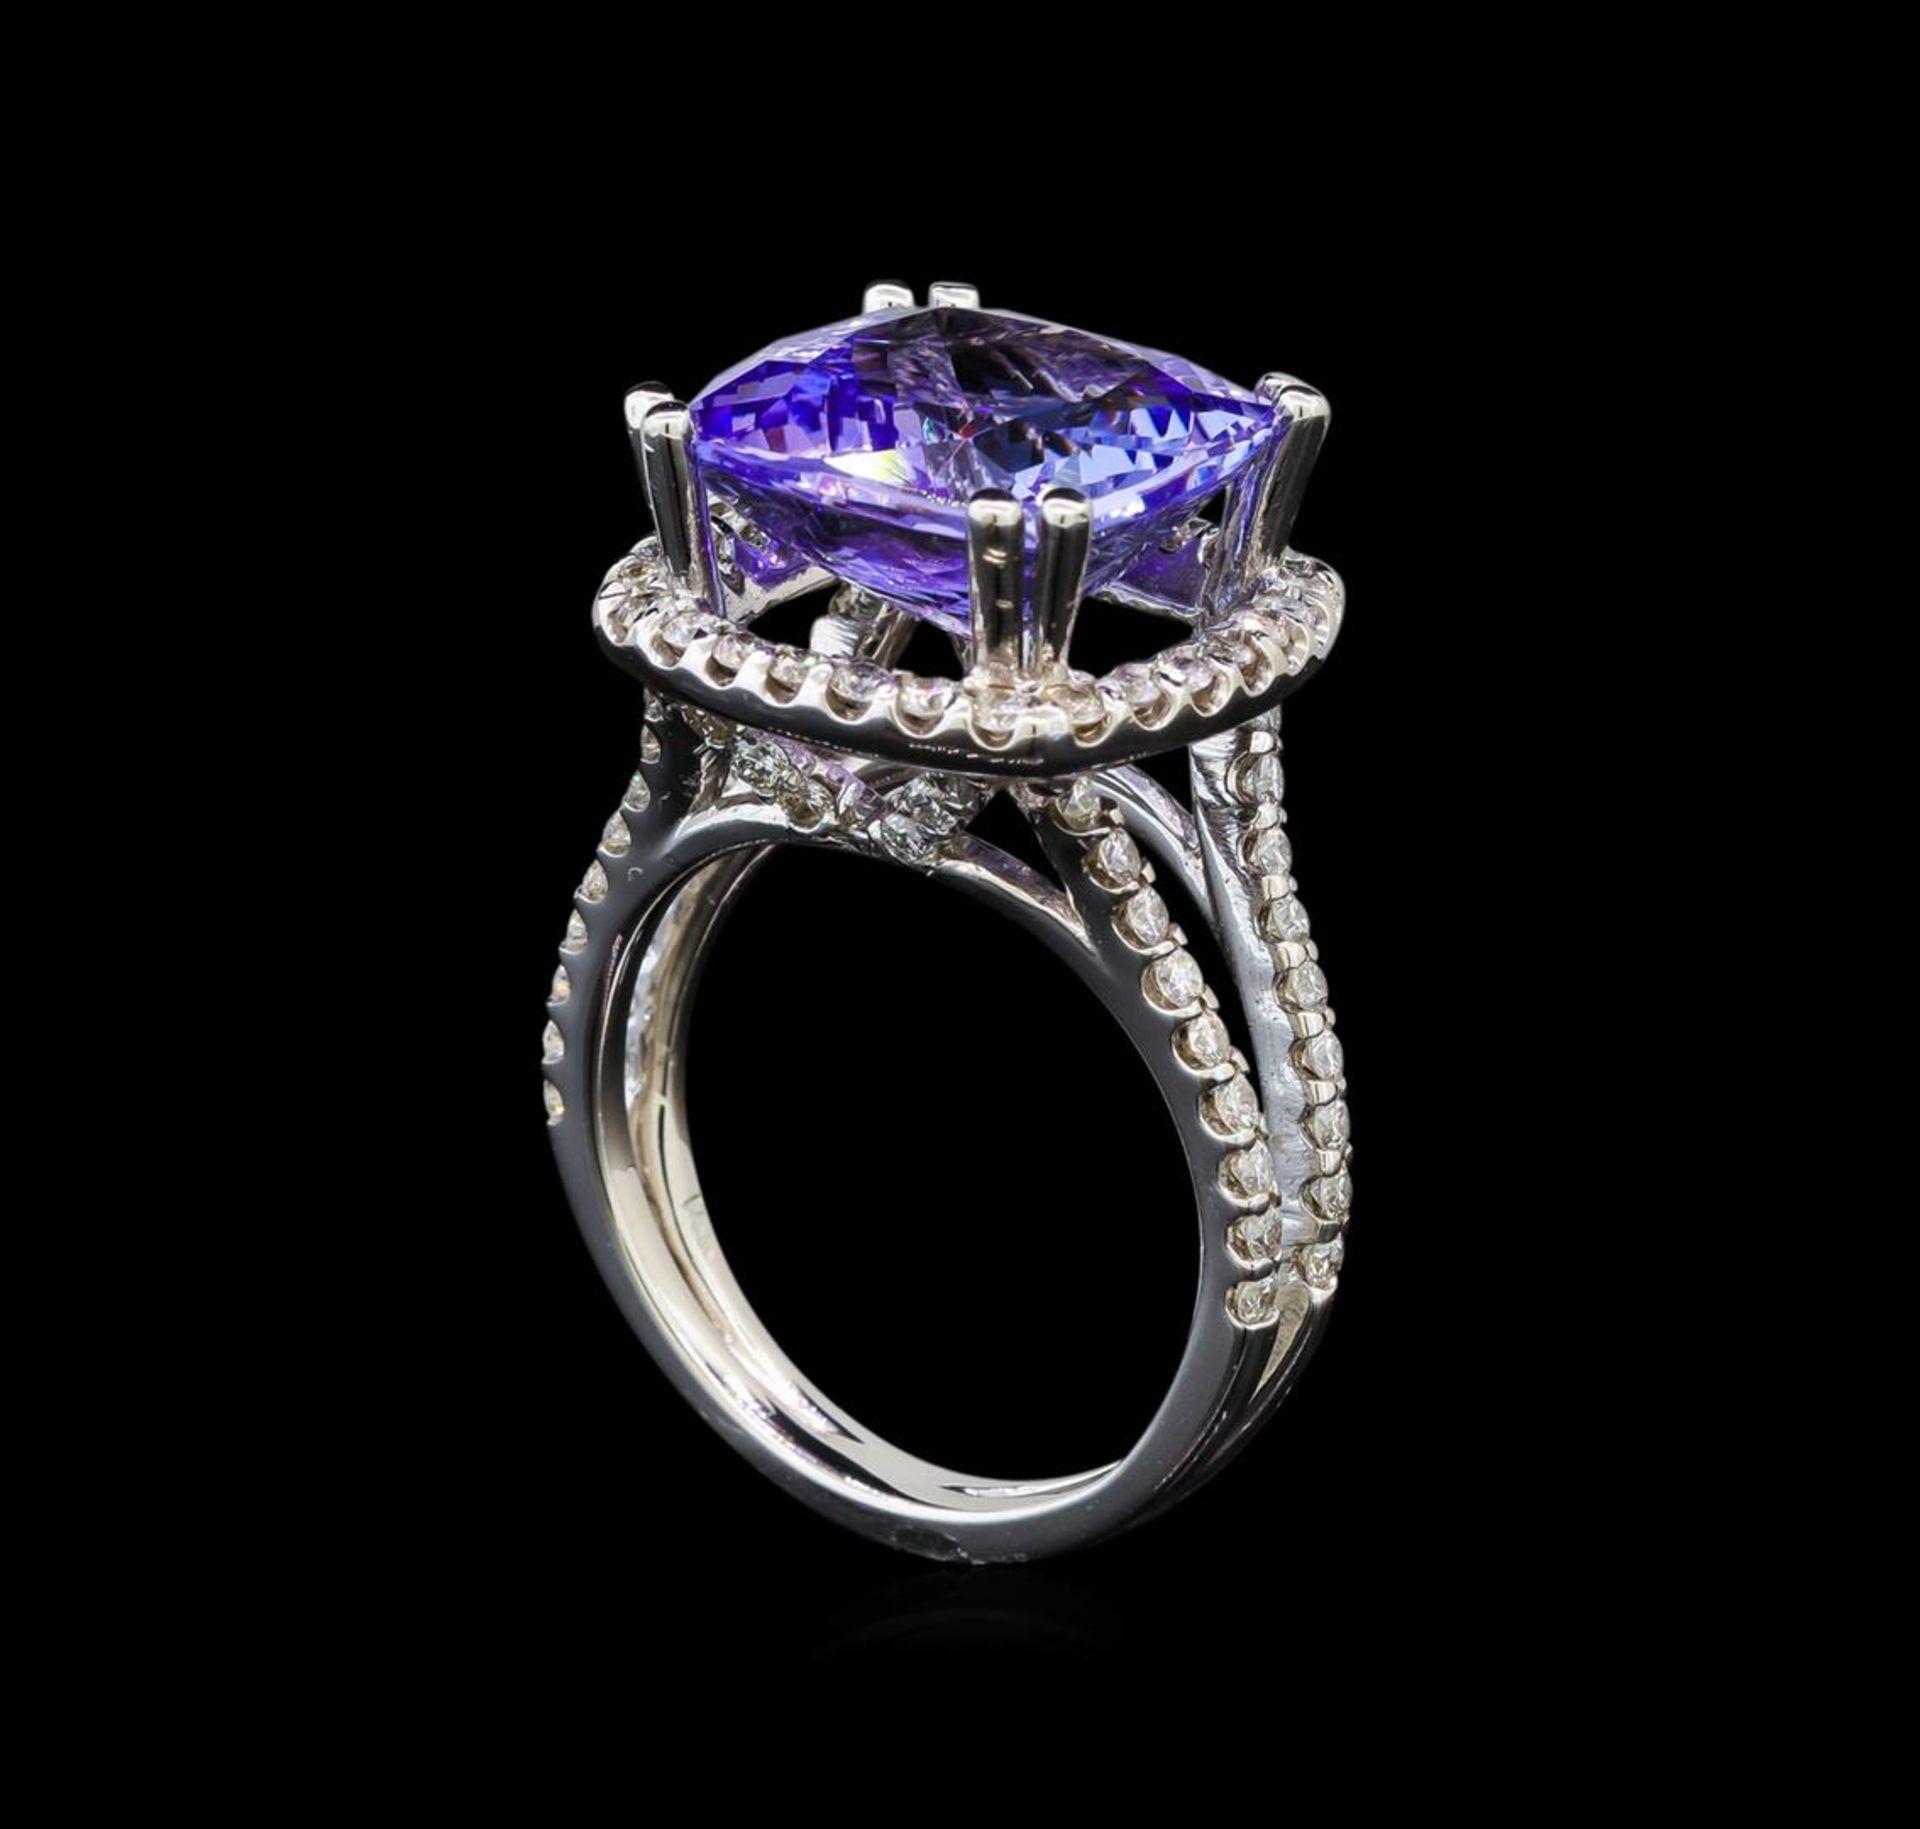 14KT White Gold 9.07 ctw Tanzanite and Diamond Ring - Image 4 of 5